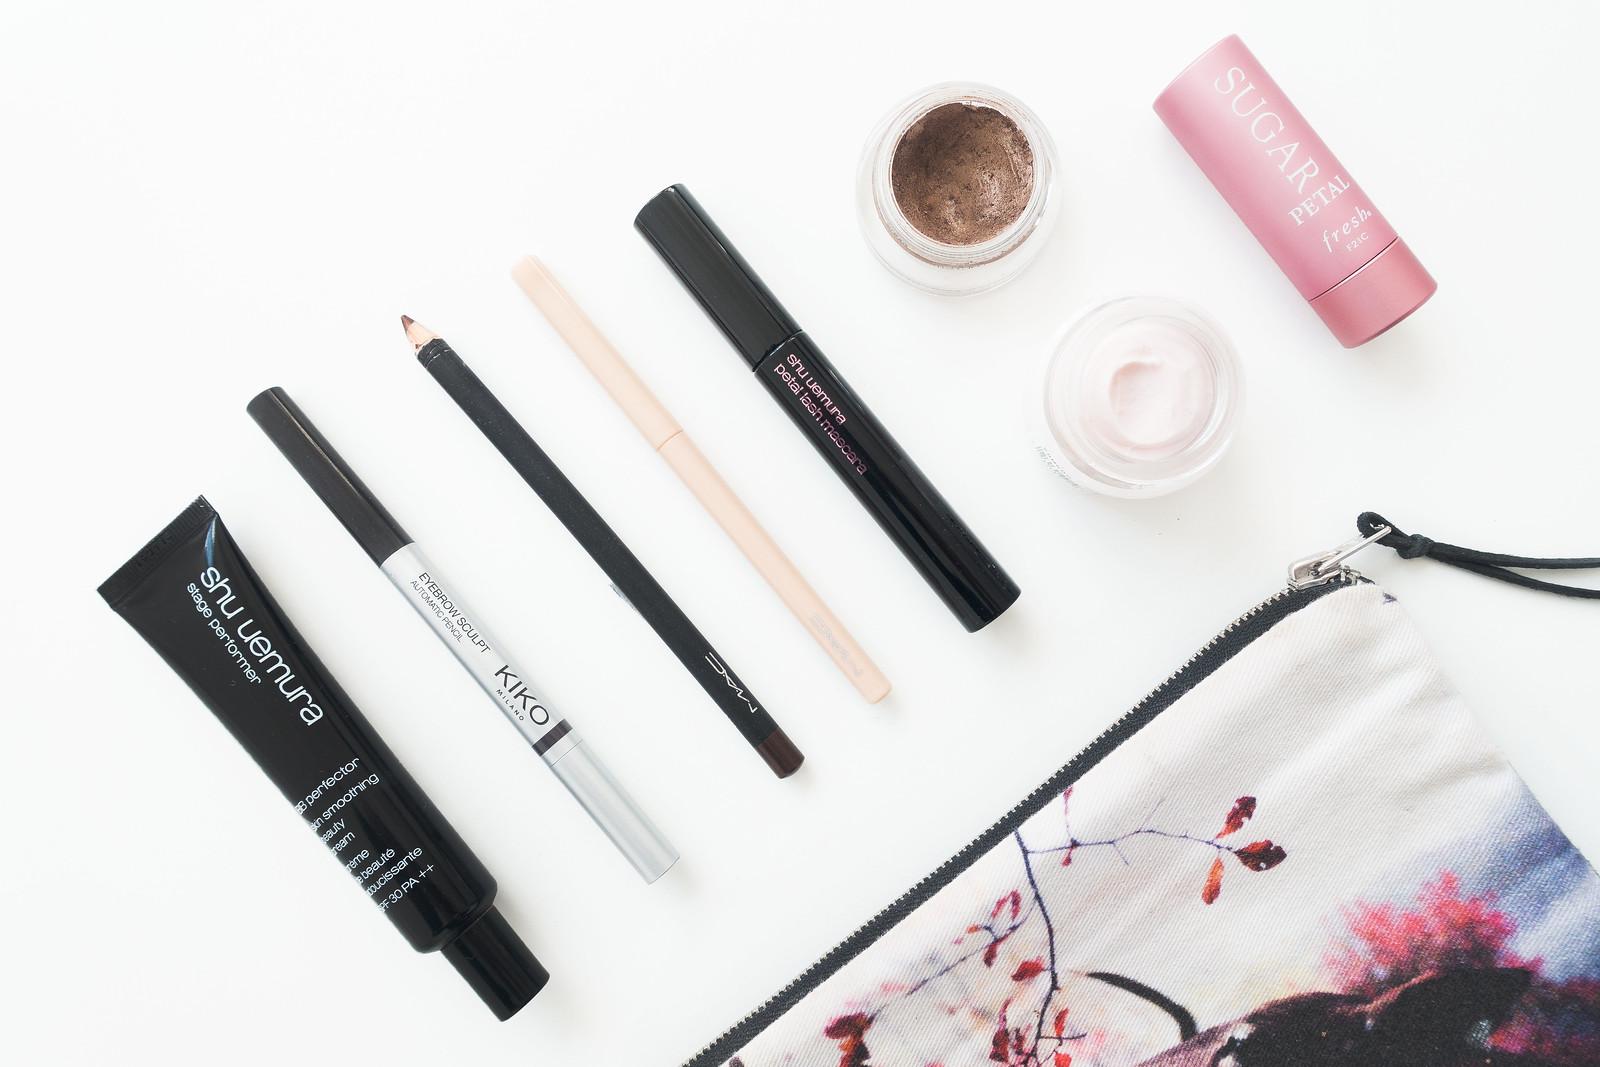 A Minimalist Make-up Bag